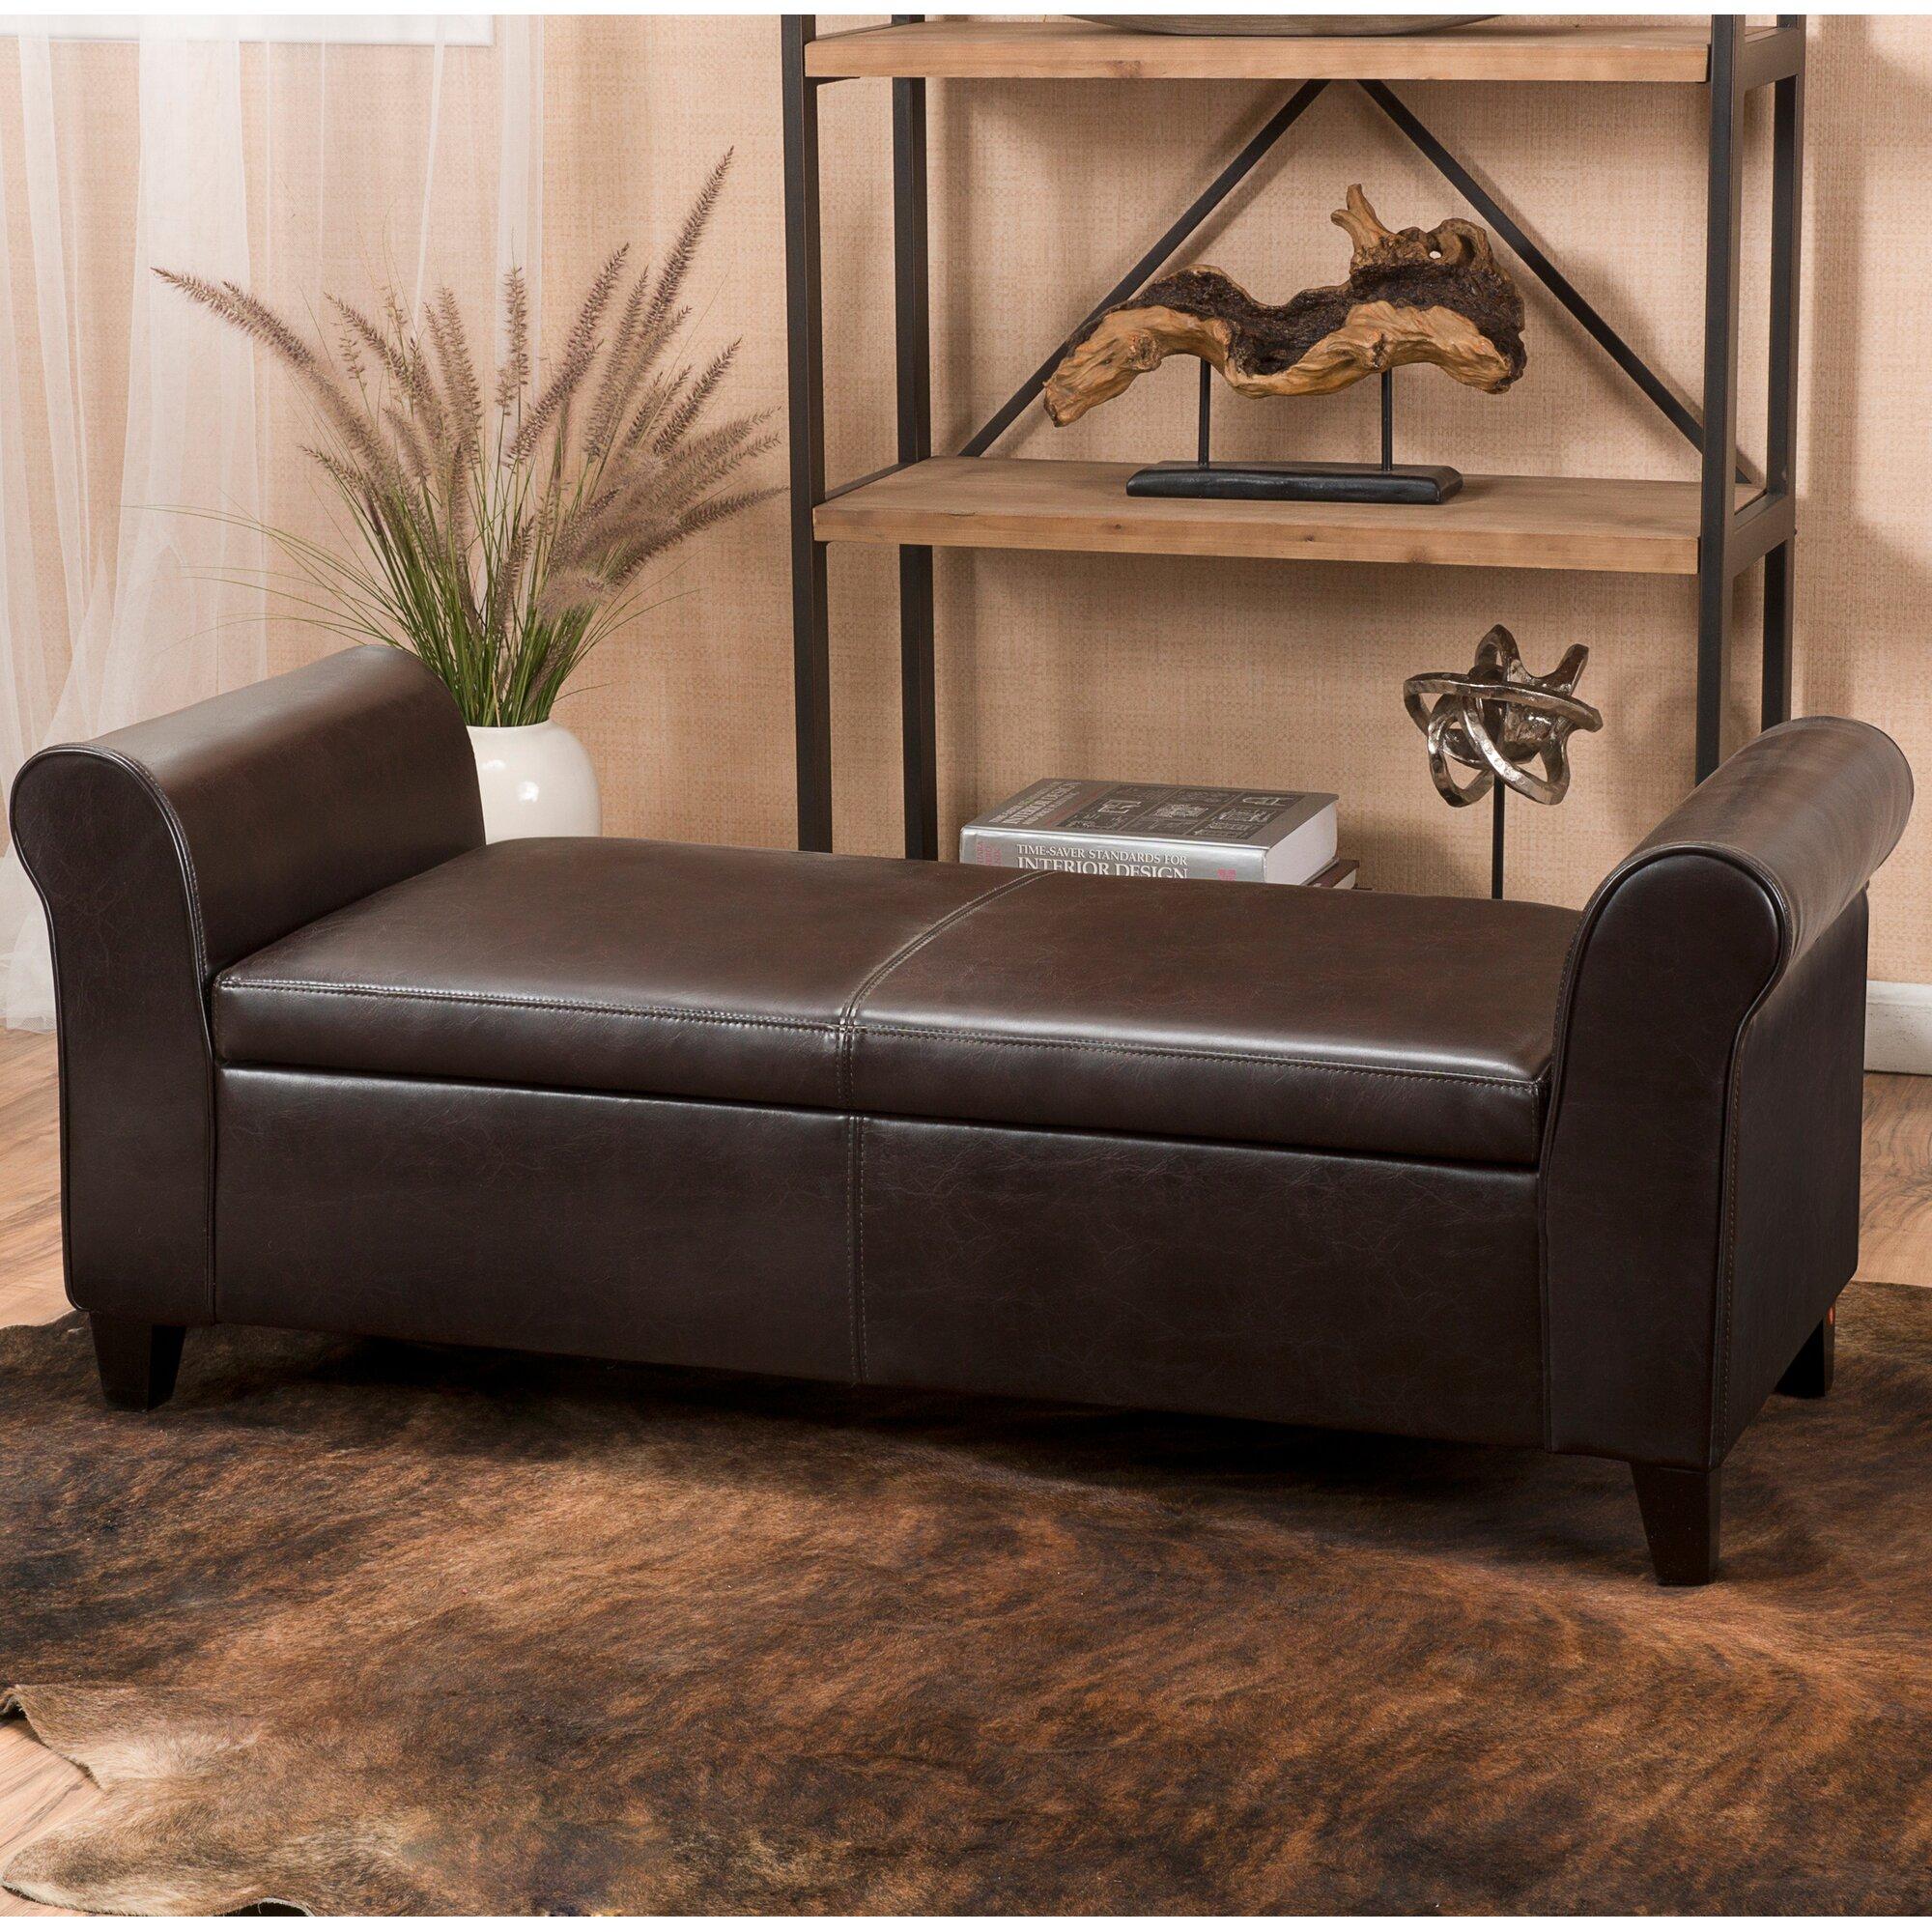 Varian Upholstered Storage Bedroom Bench & Reviews